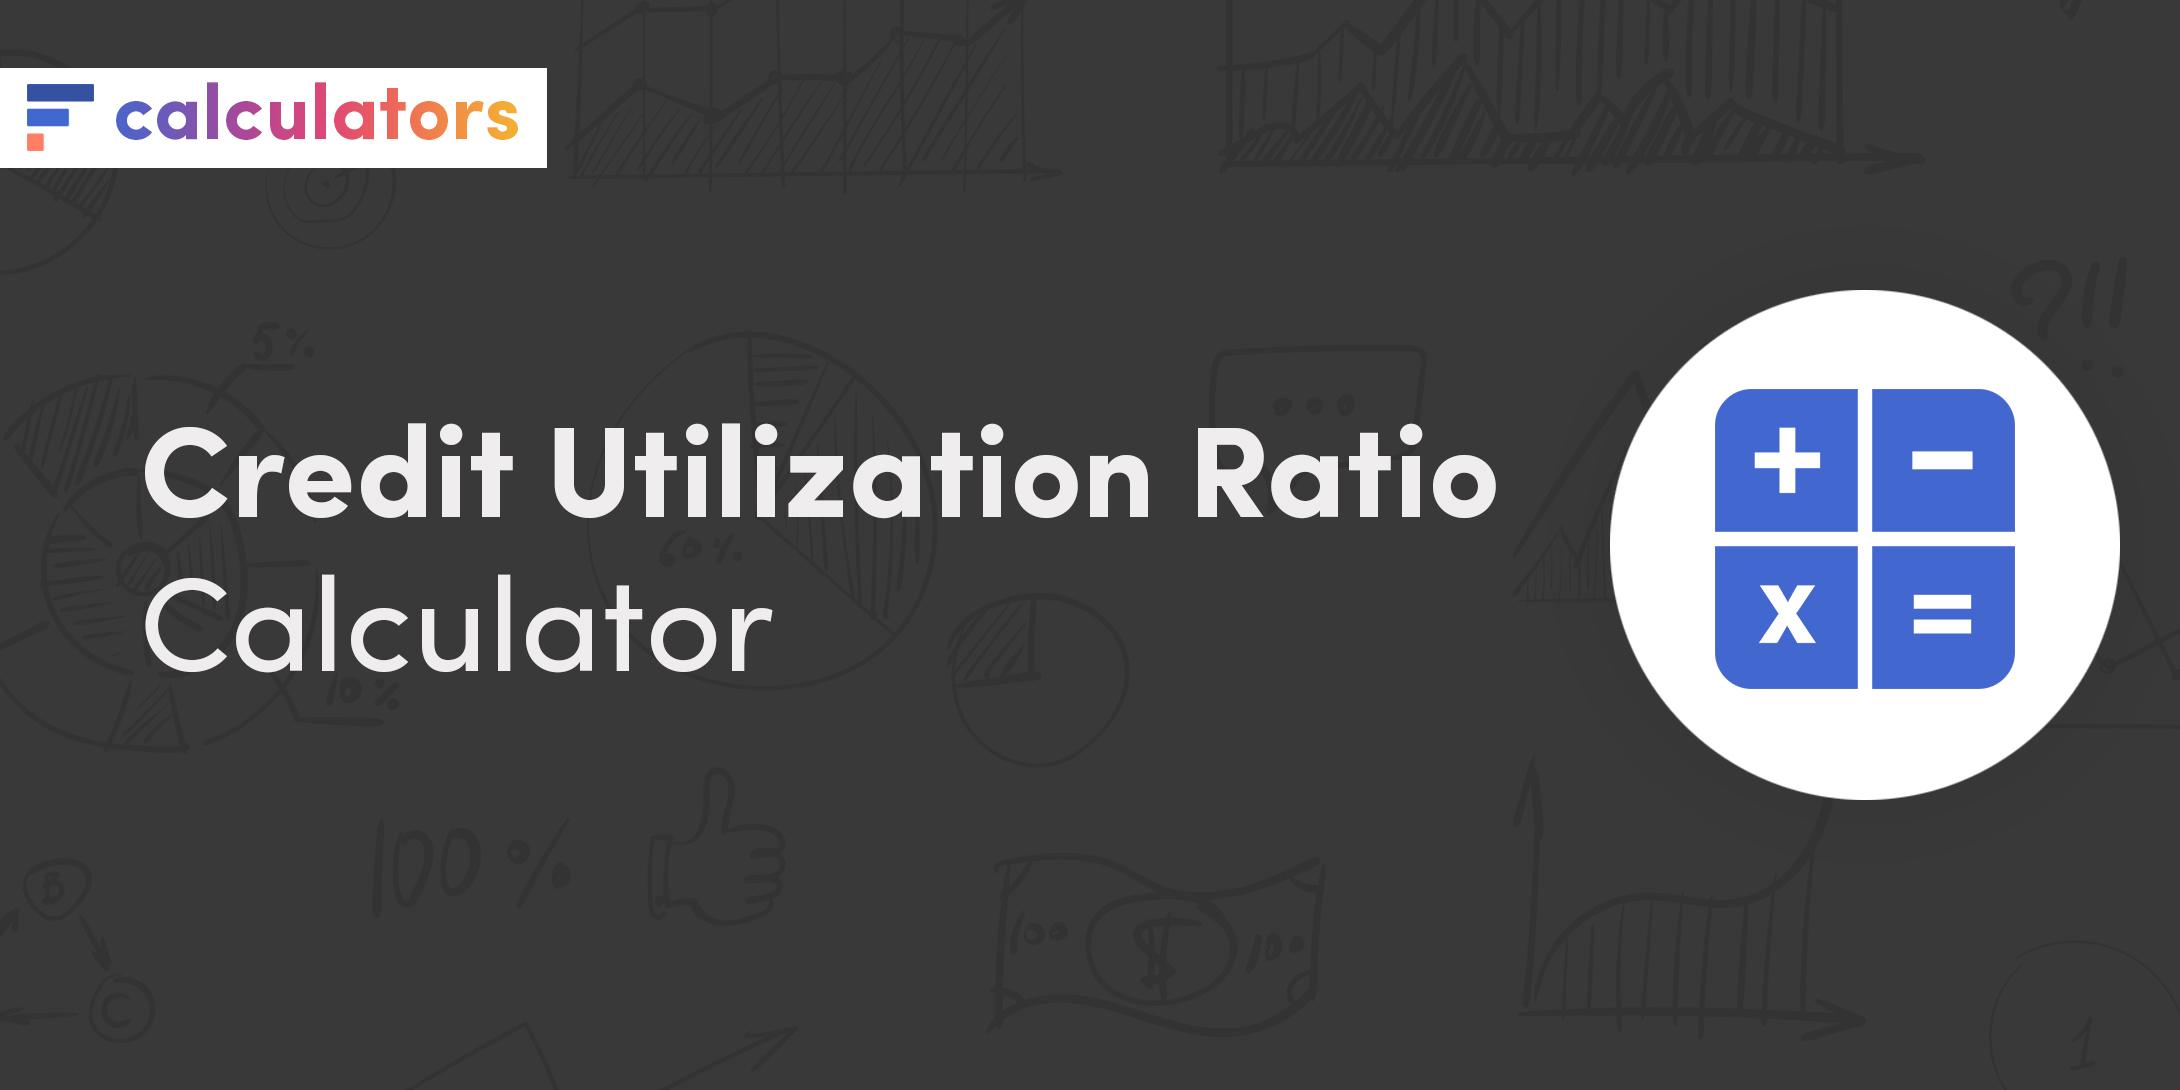 Credit utilization ratio calculator